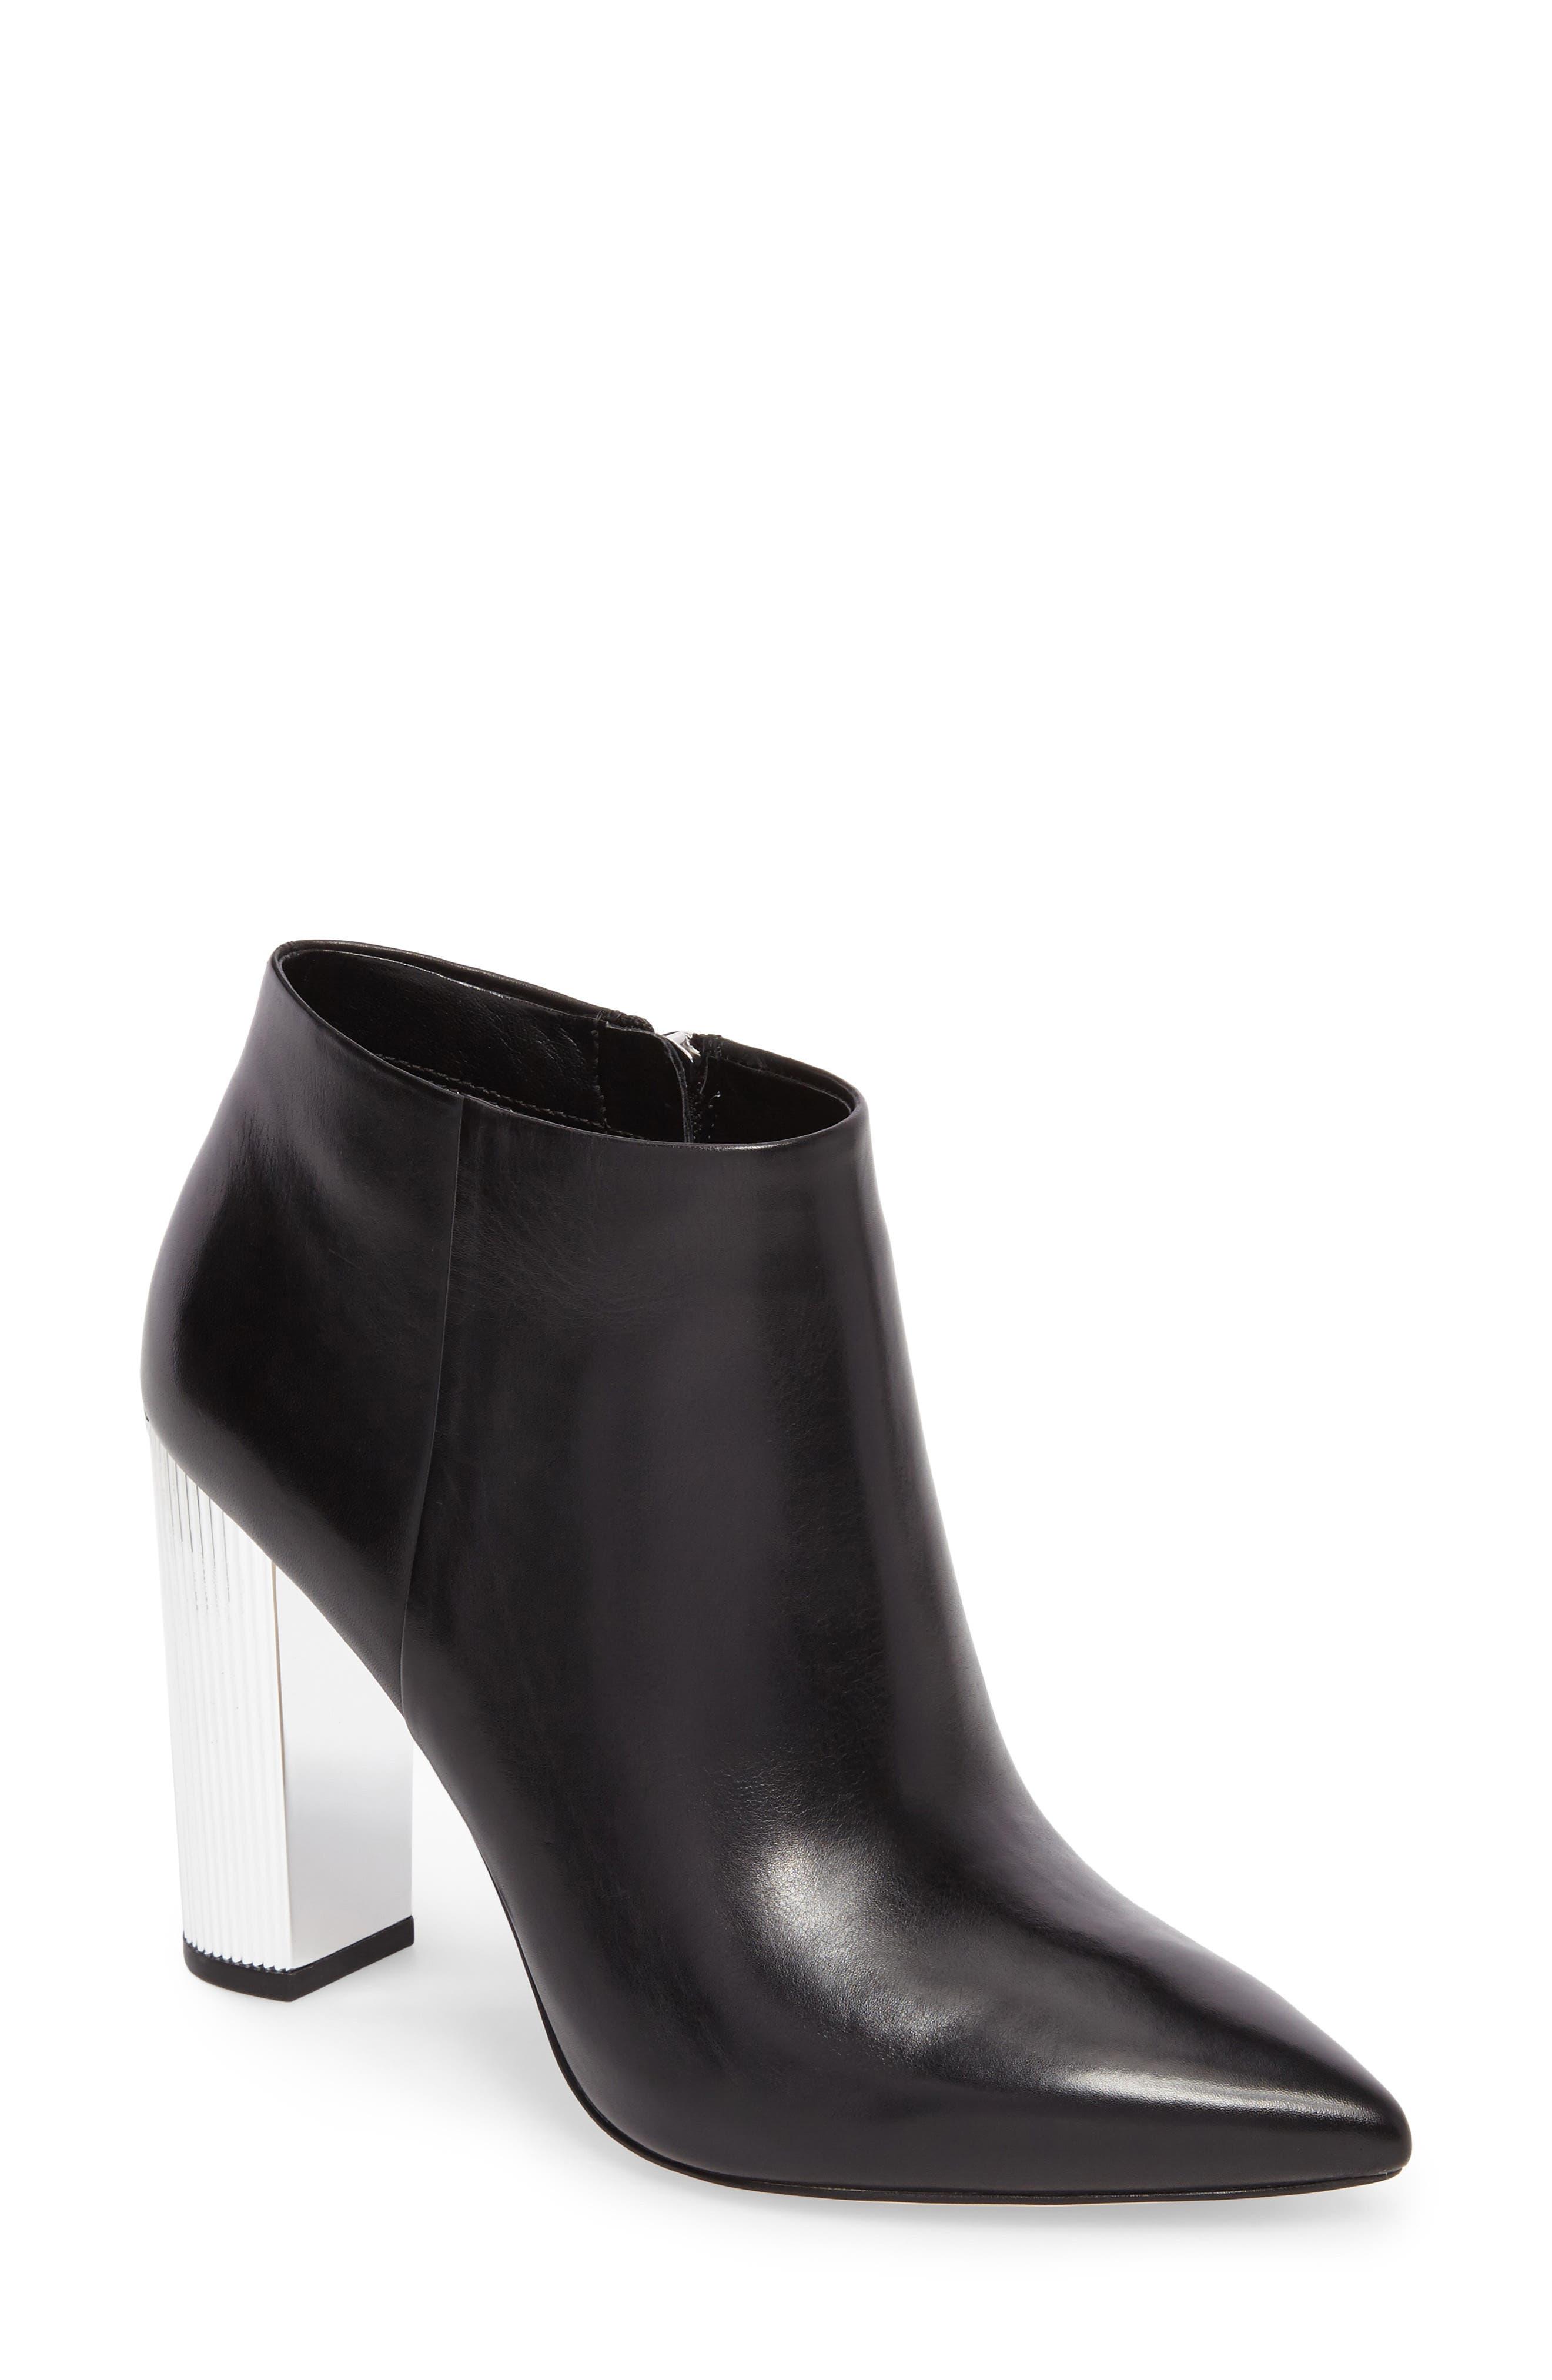 Paloma Bootie,                         Main,                         color, Black Calf Leather